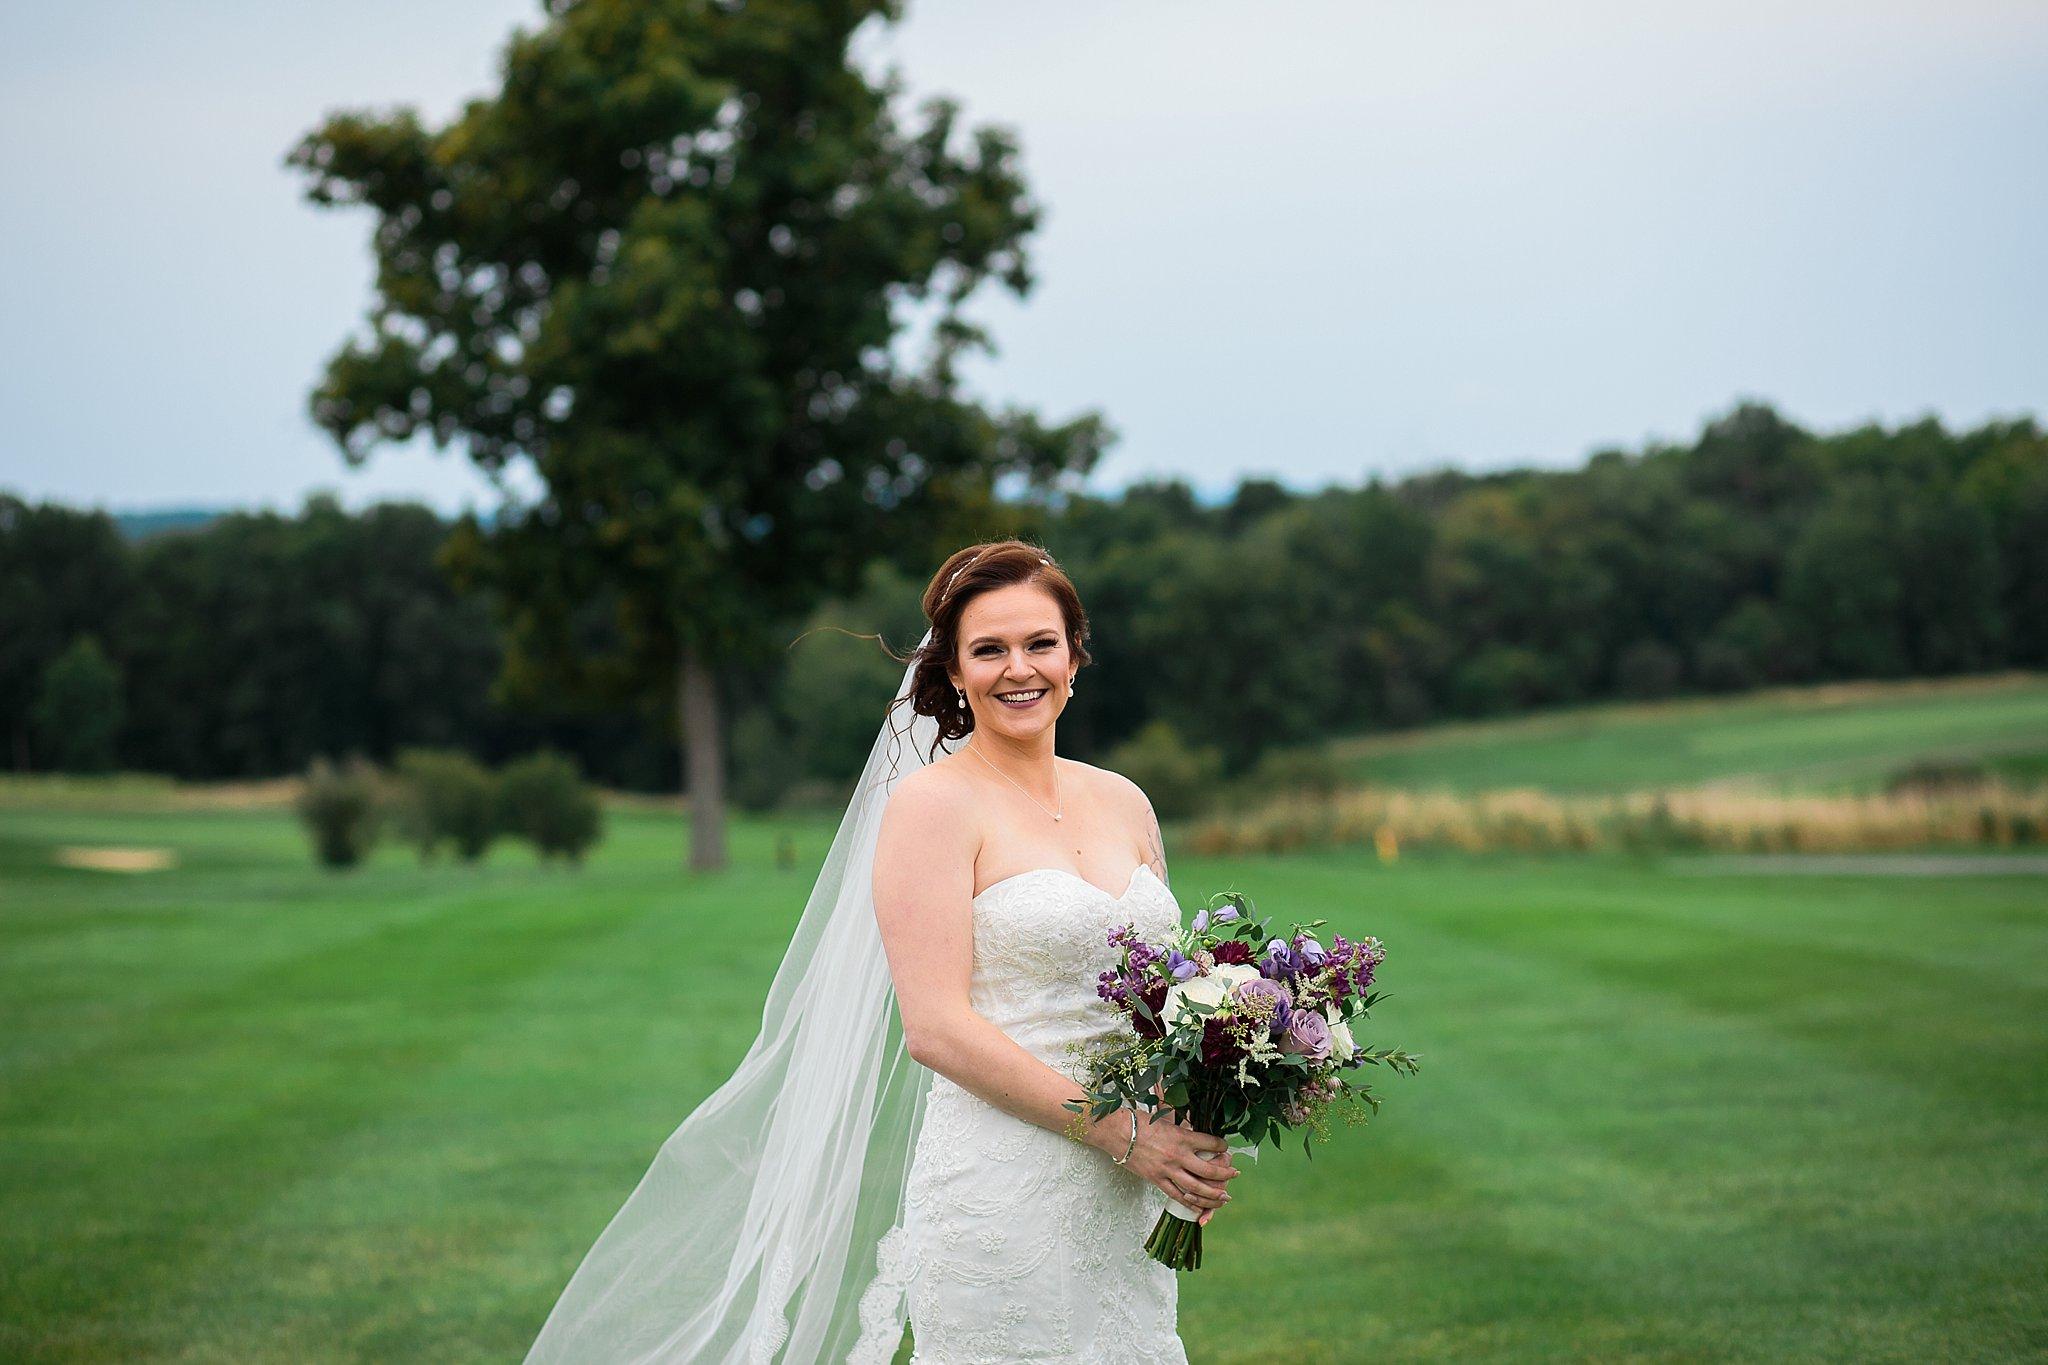 Links at Unionvale Wedding Lagrangeville Wedding Hudson Valley Wedding Photographer Sweet Alice Photography41.jpg